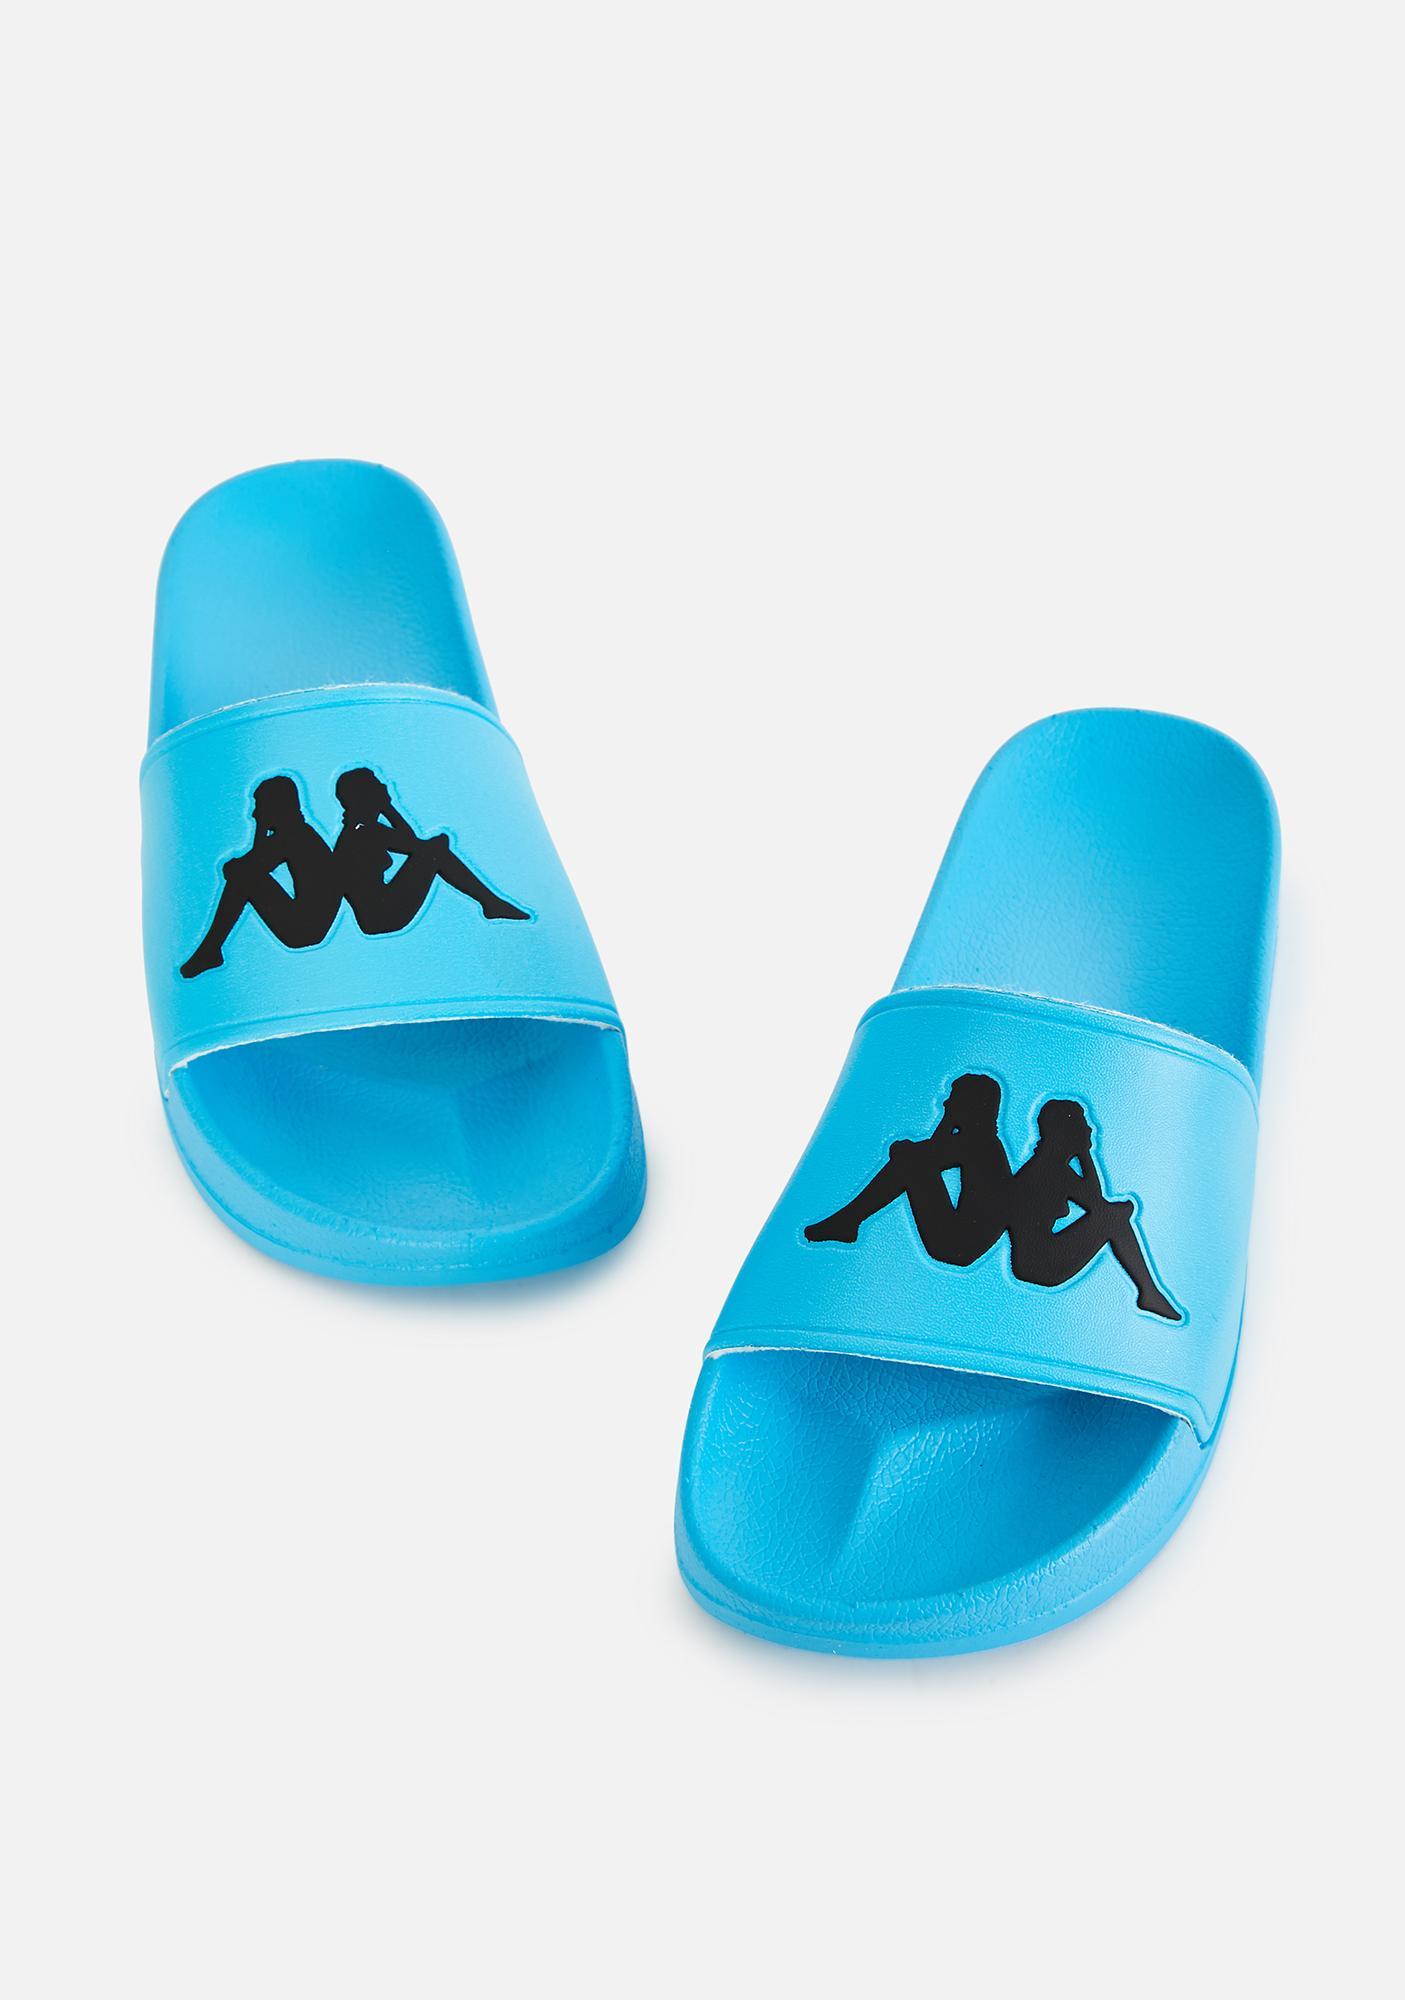 Kappa Teal Blue Authentic Adam 2 Slide Sandals